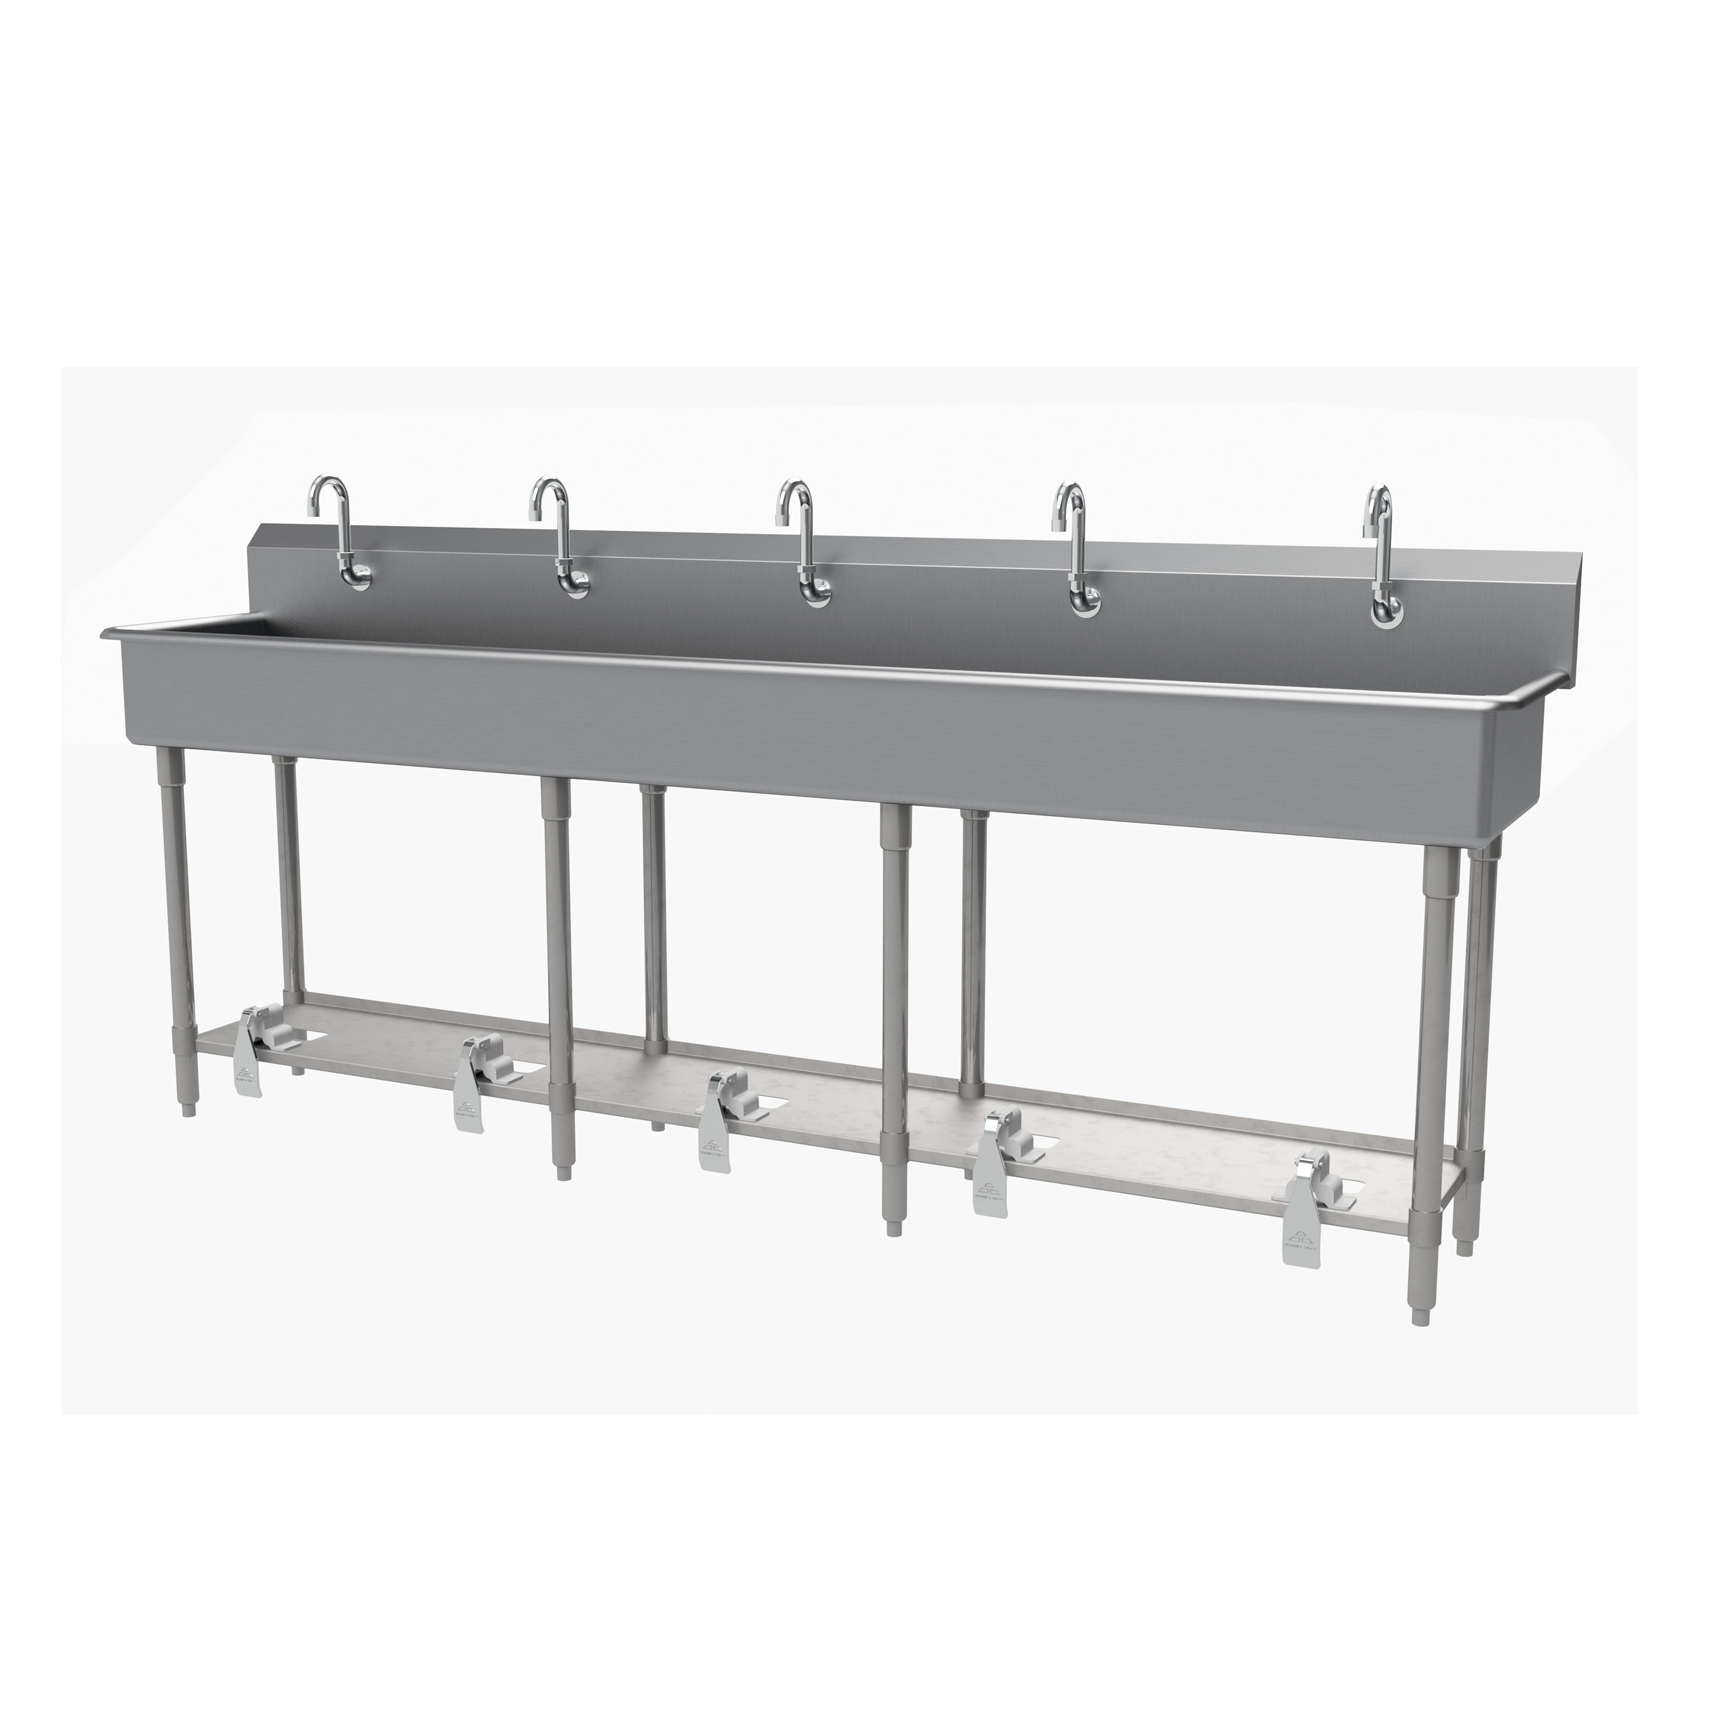 Advance Tabco FC-FM-100FV sink, hand